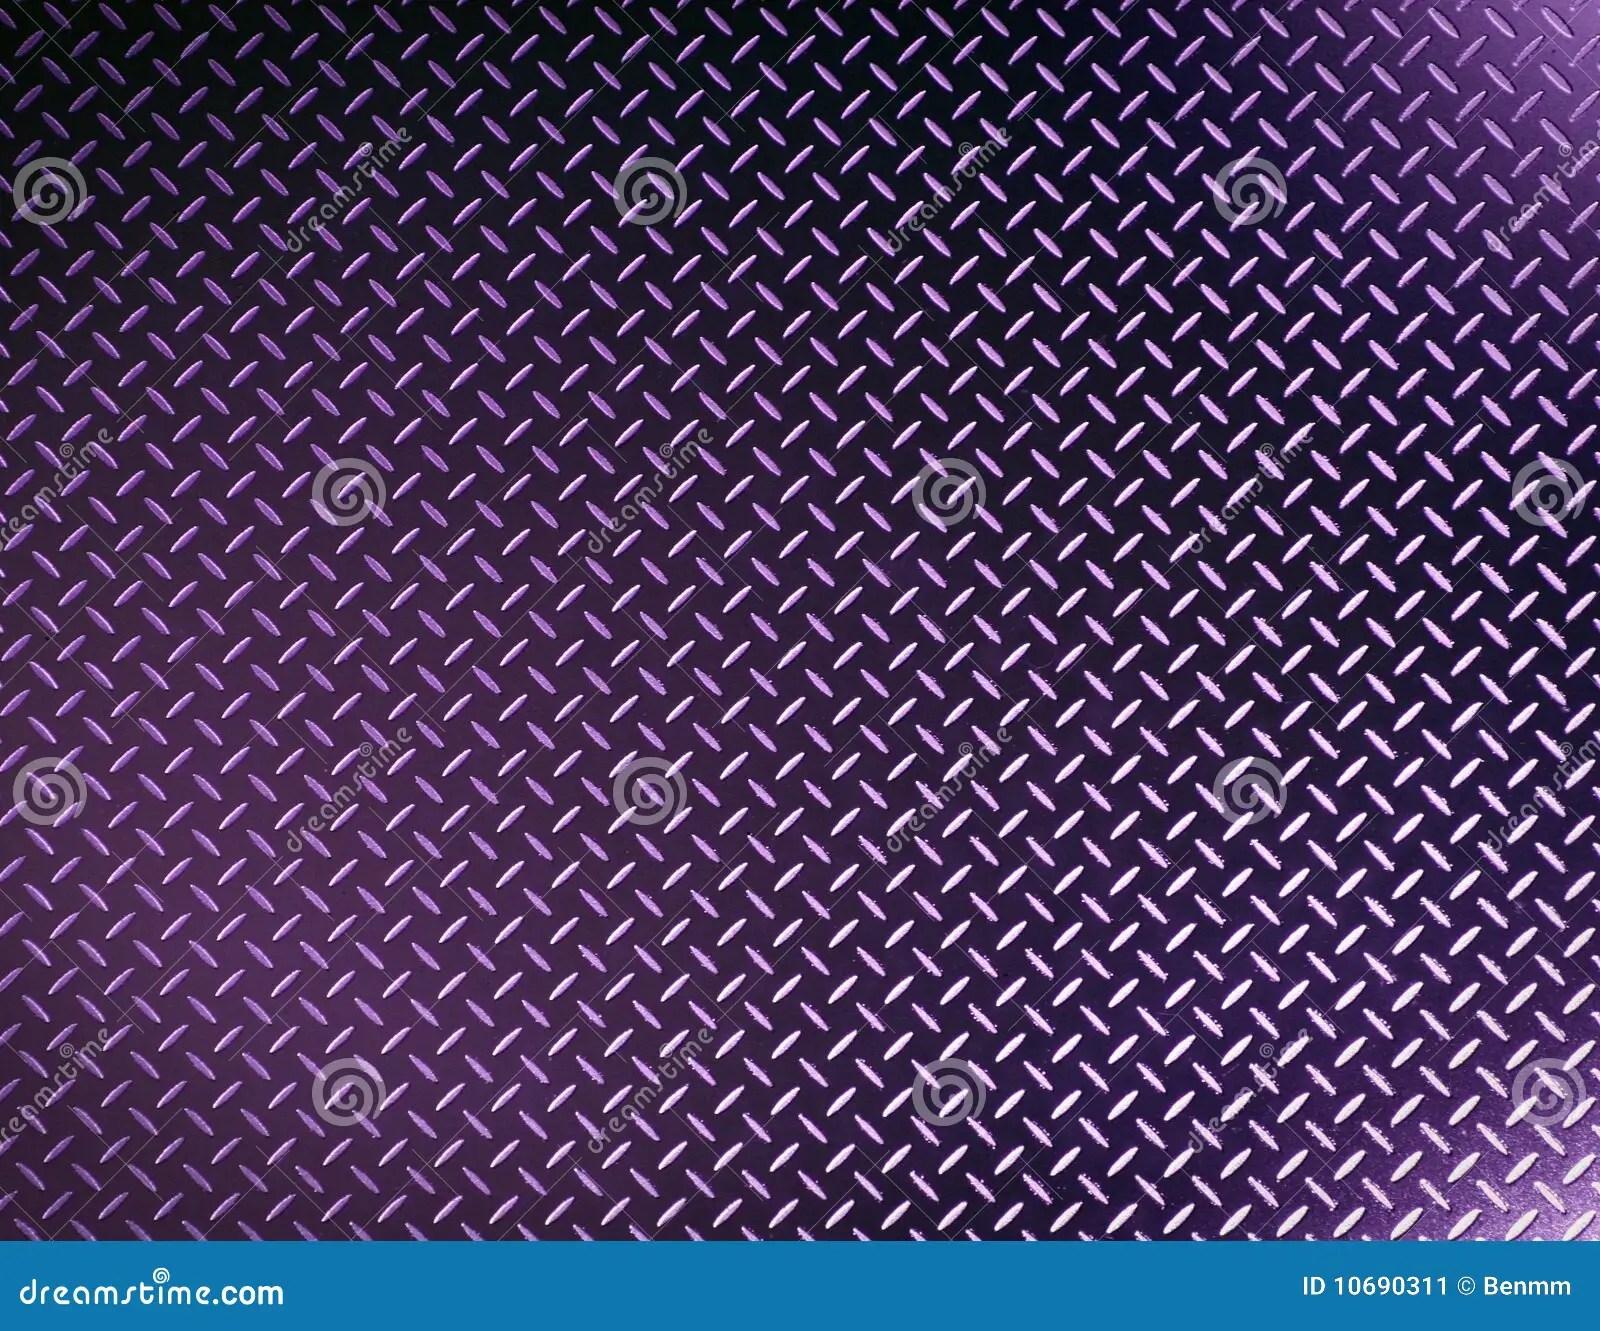 Black Diamond Plate Wallpaper Futuristic Metal Texture Stock Image Image 10690311